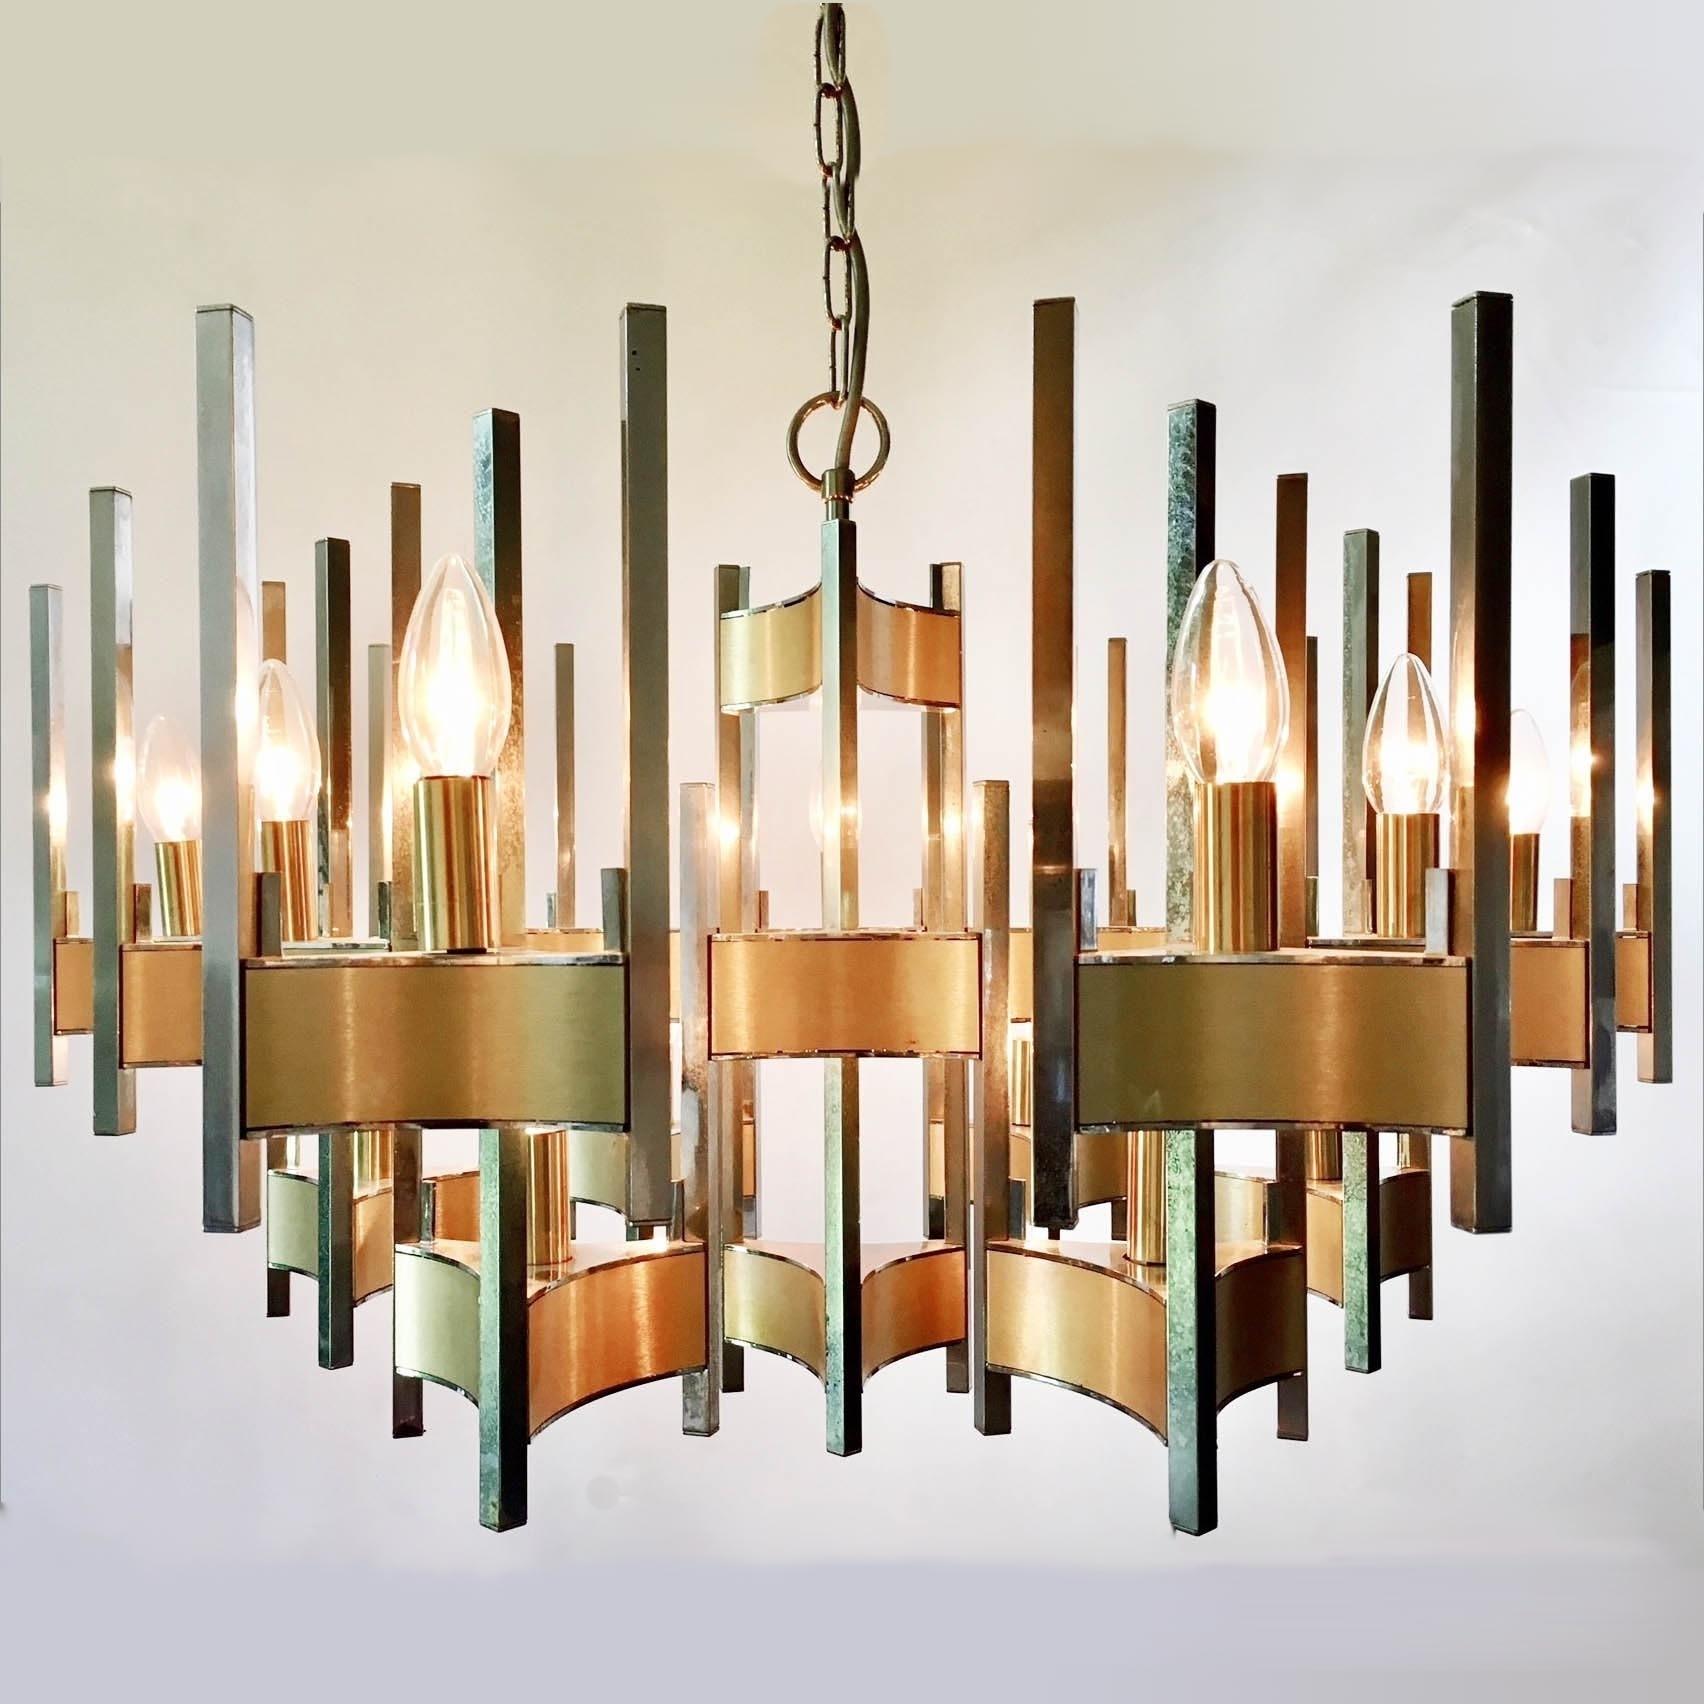 Beautiful Sciolari chandelier from the 70s